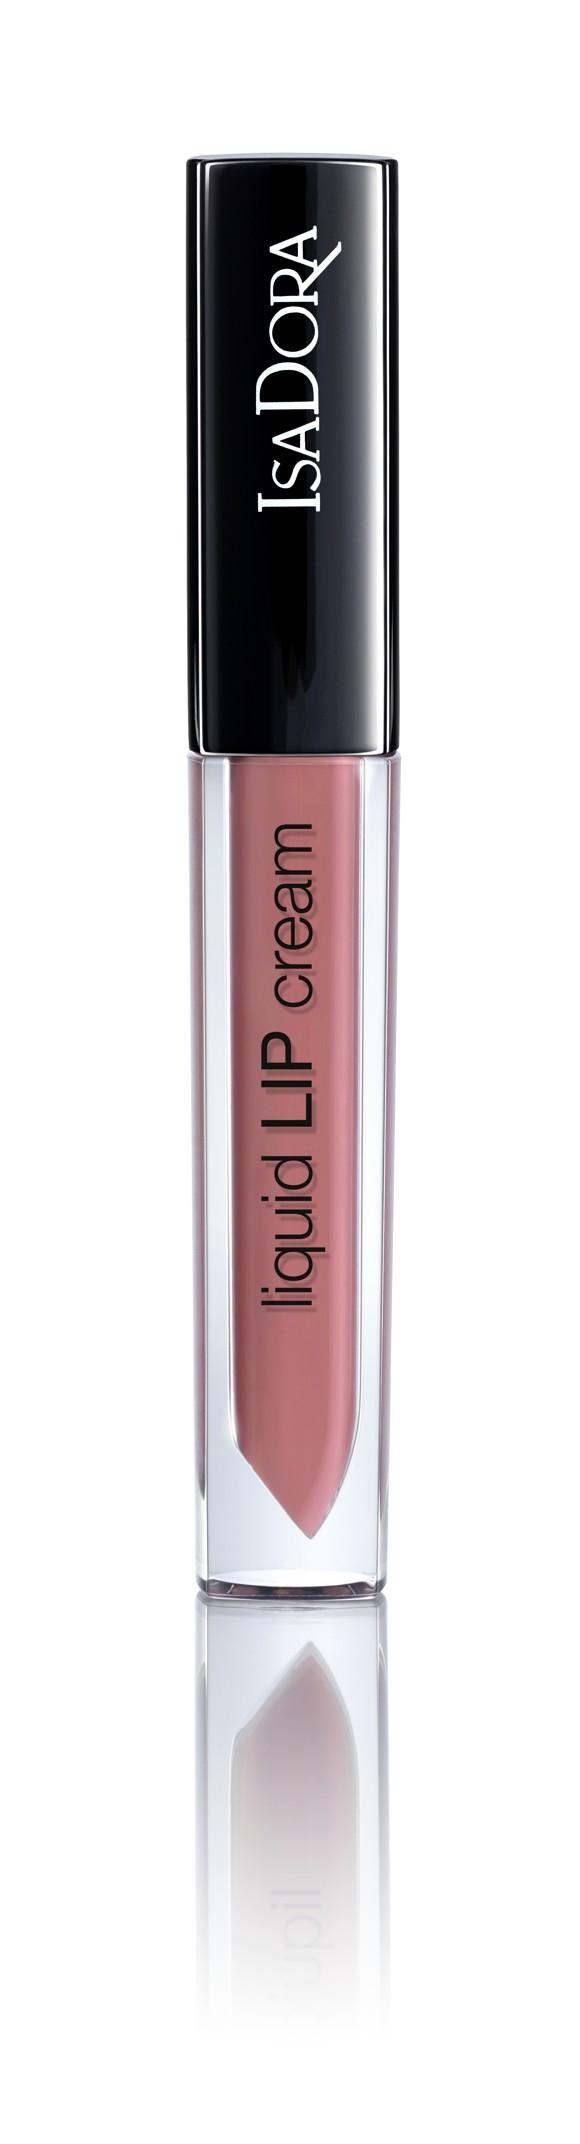 IsaDora - Liquid Lip Cream - Pink Blossom